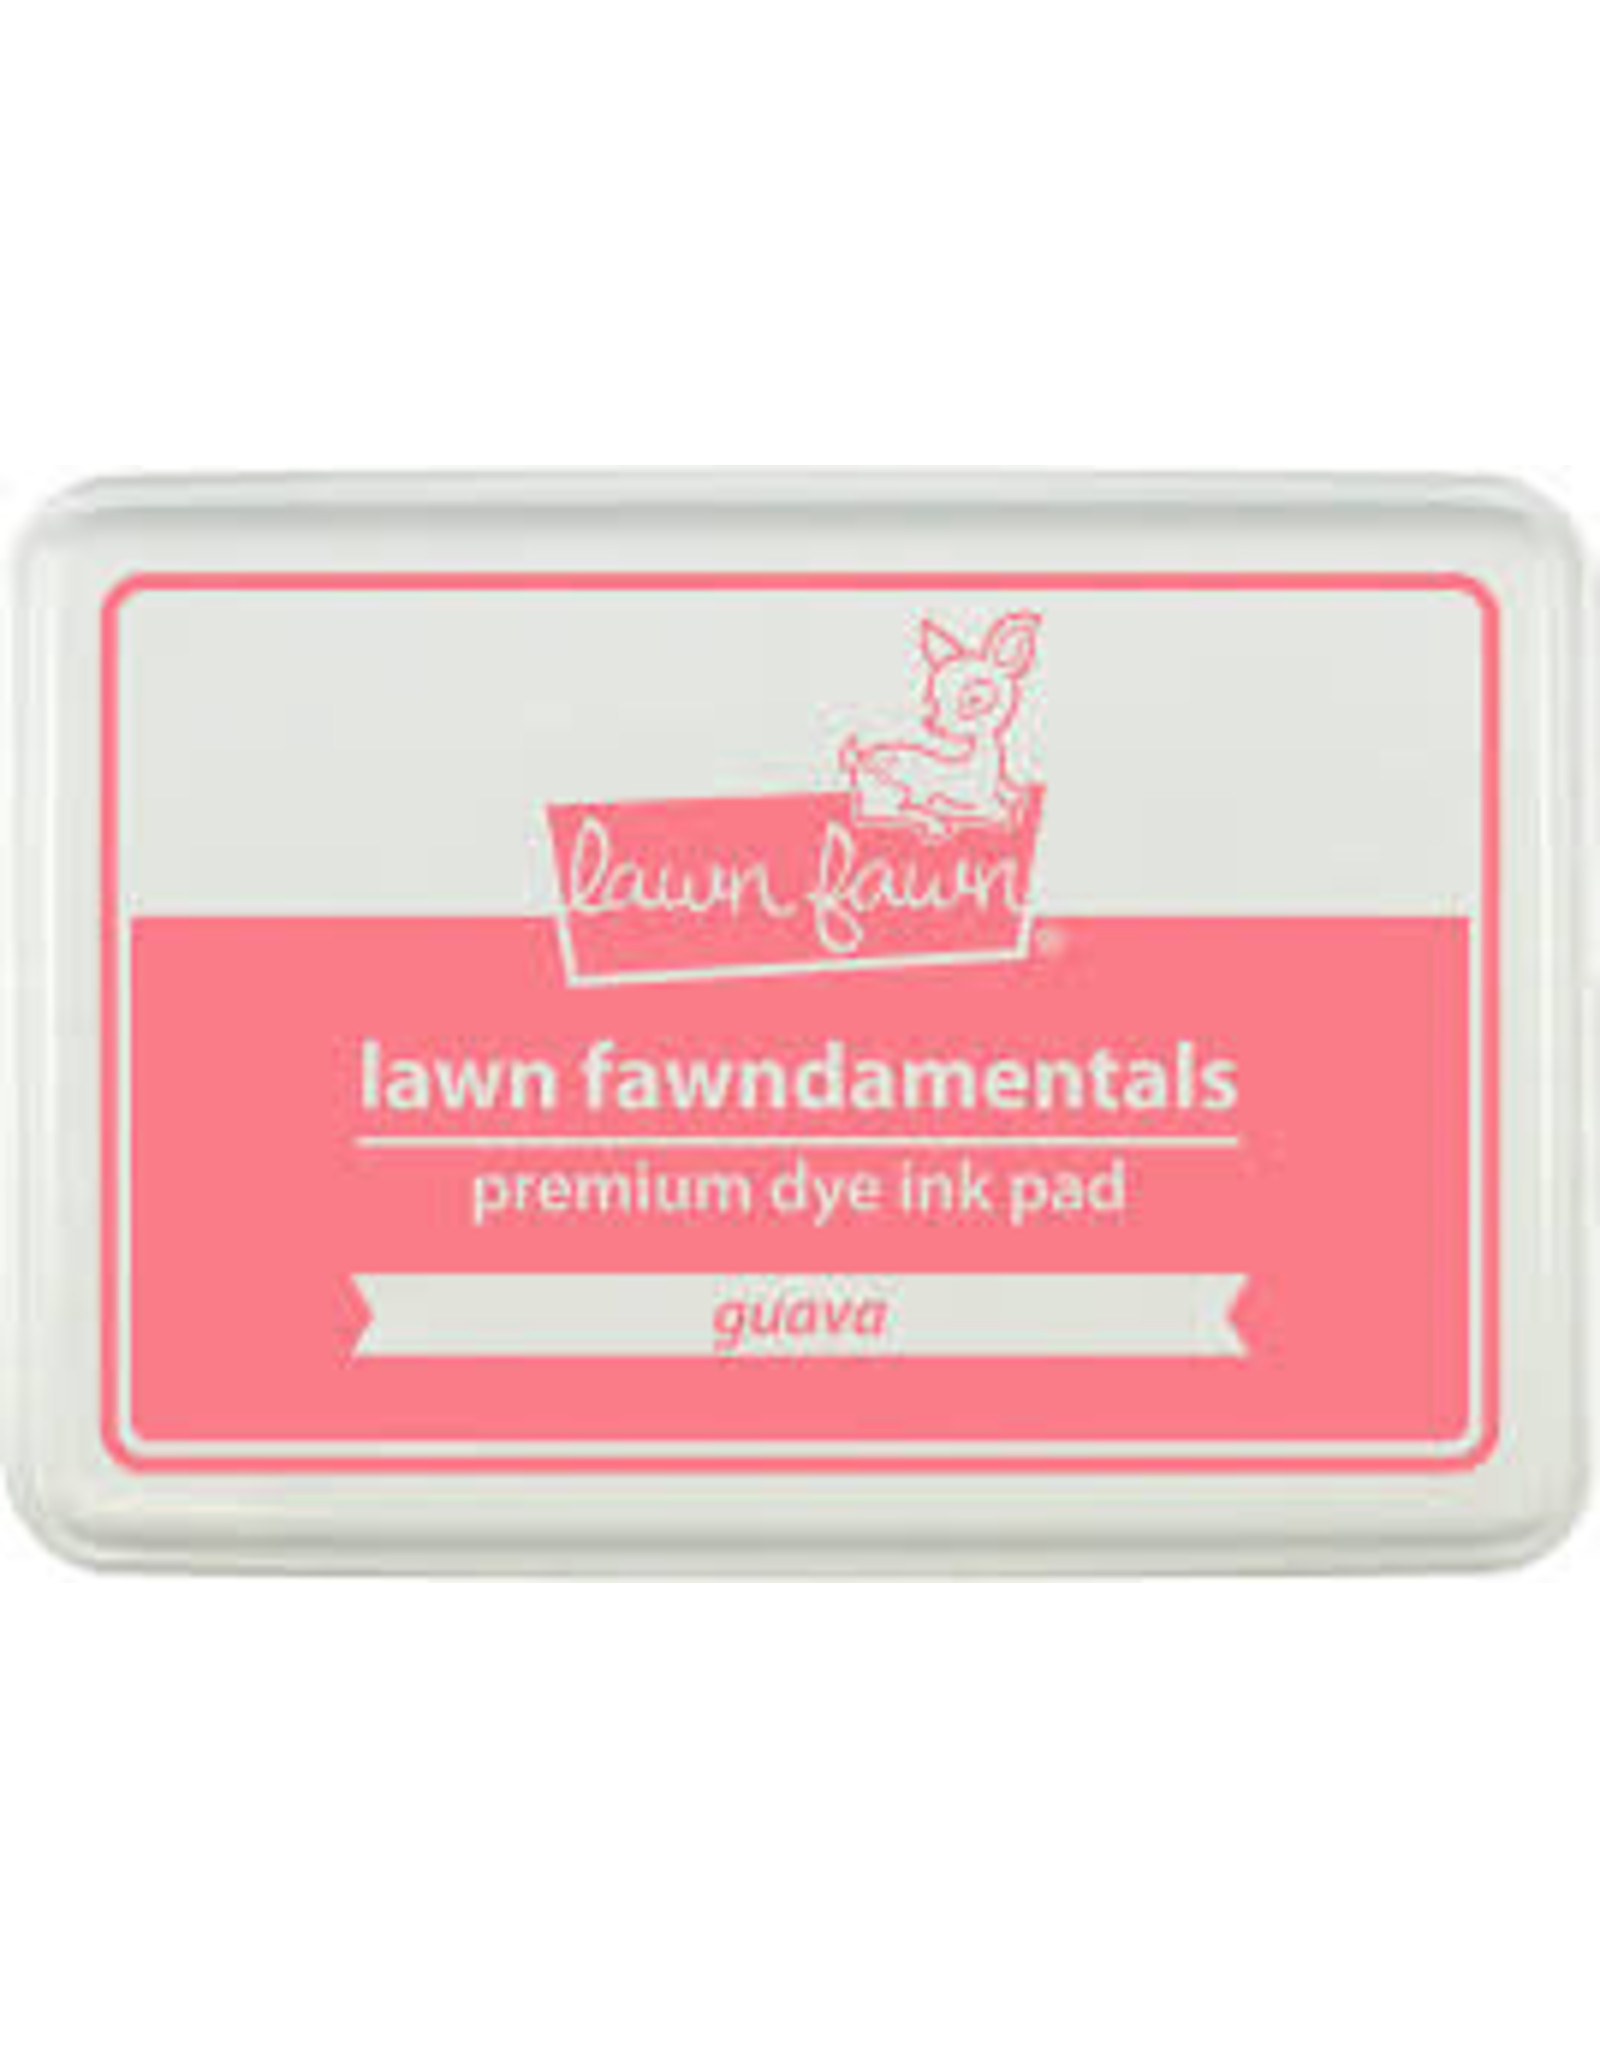 Lawn Fawn Lawn Fawndamentals Dye Ink Pad - Guava